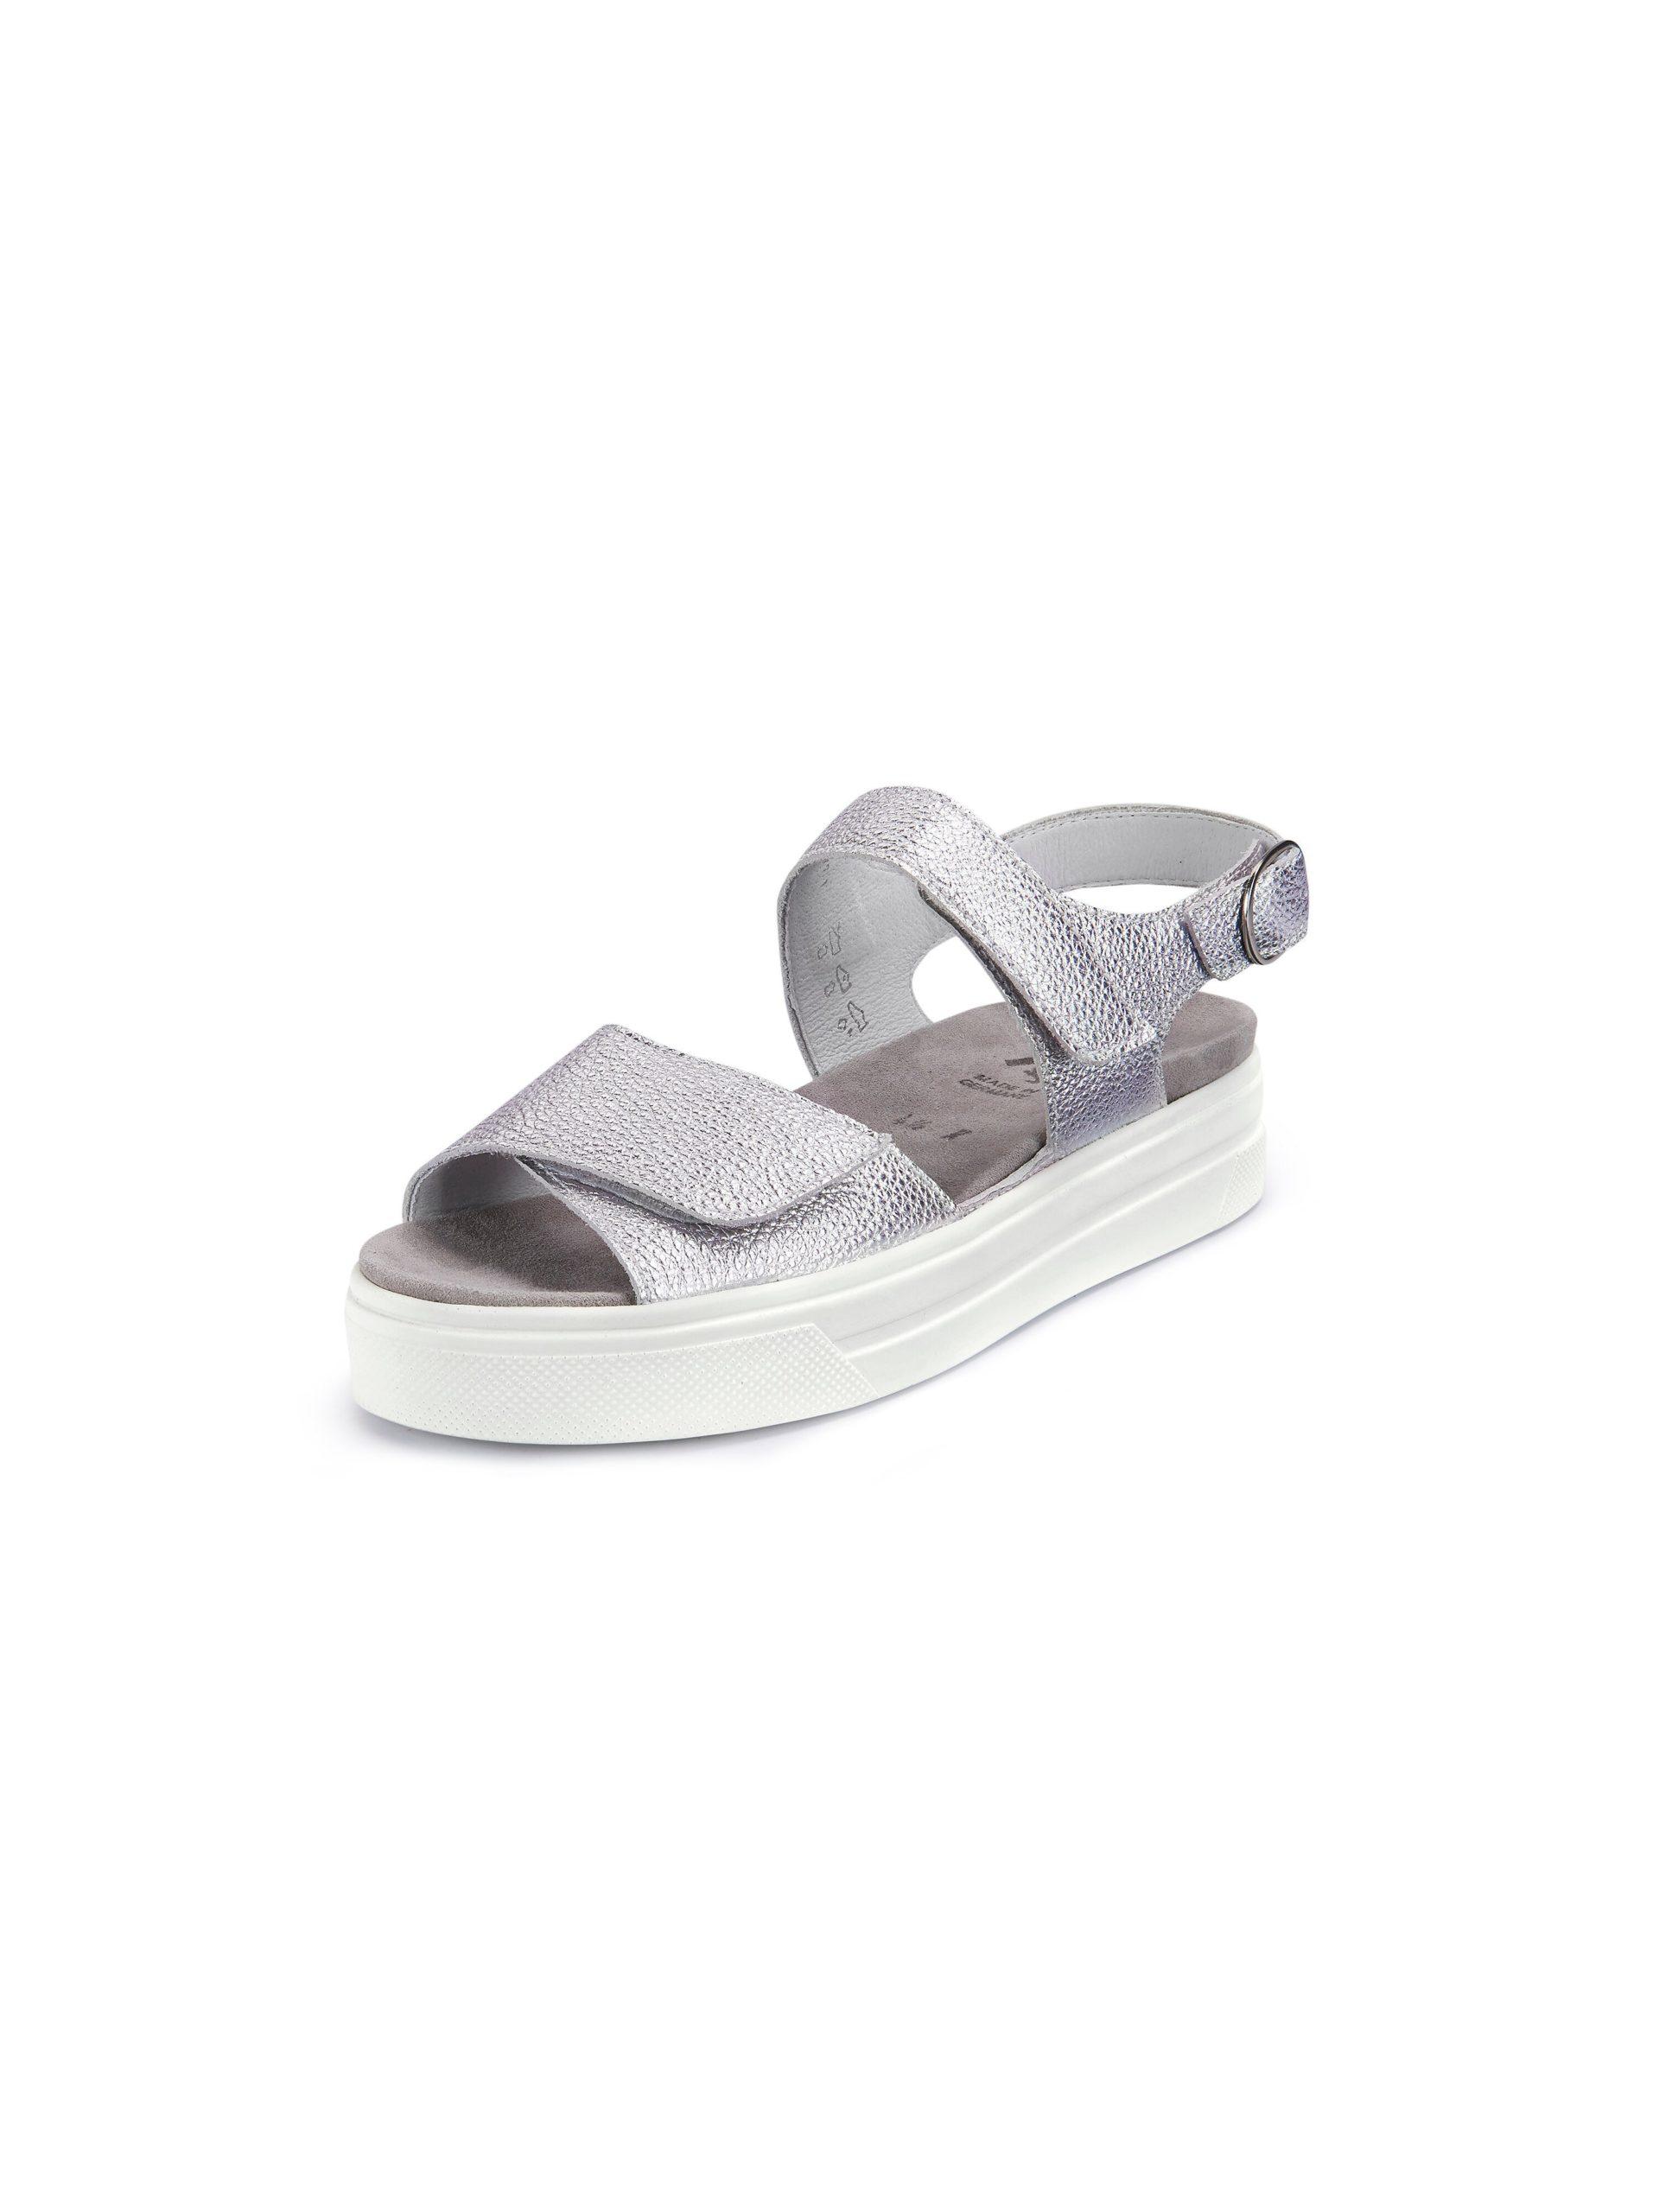 Plateau-sandalen Van Semler zilverkleur Kopen